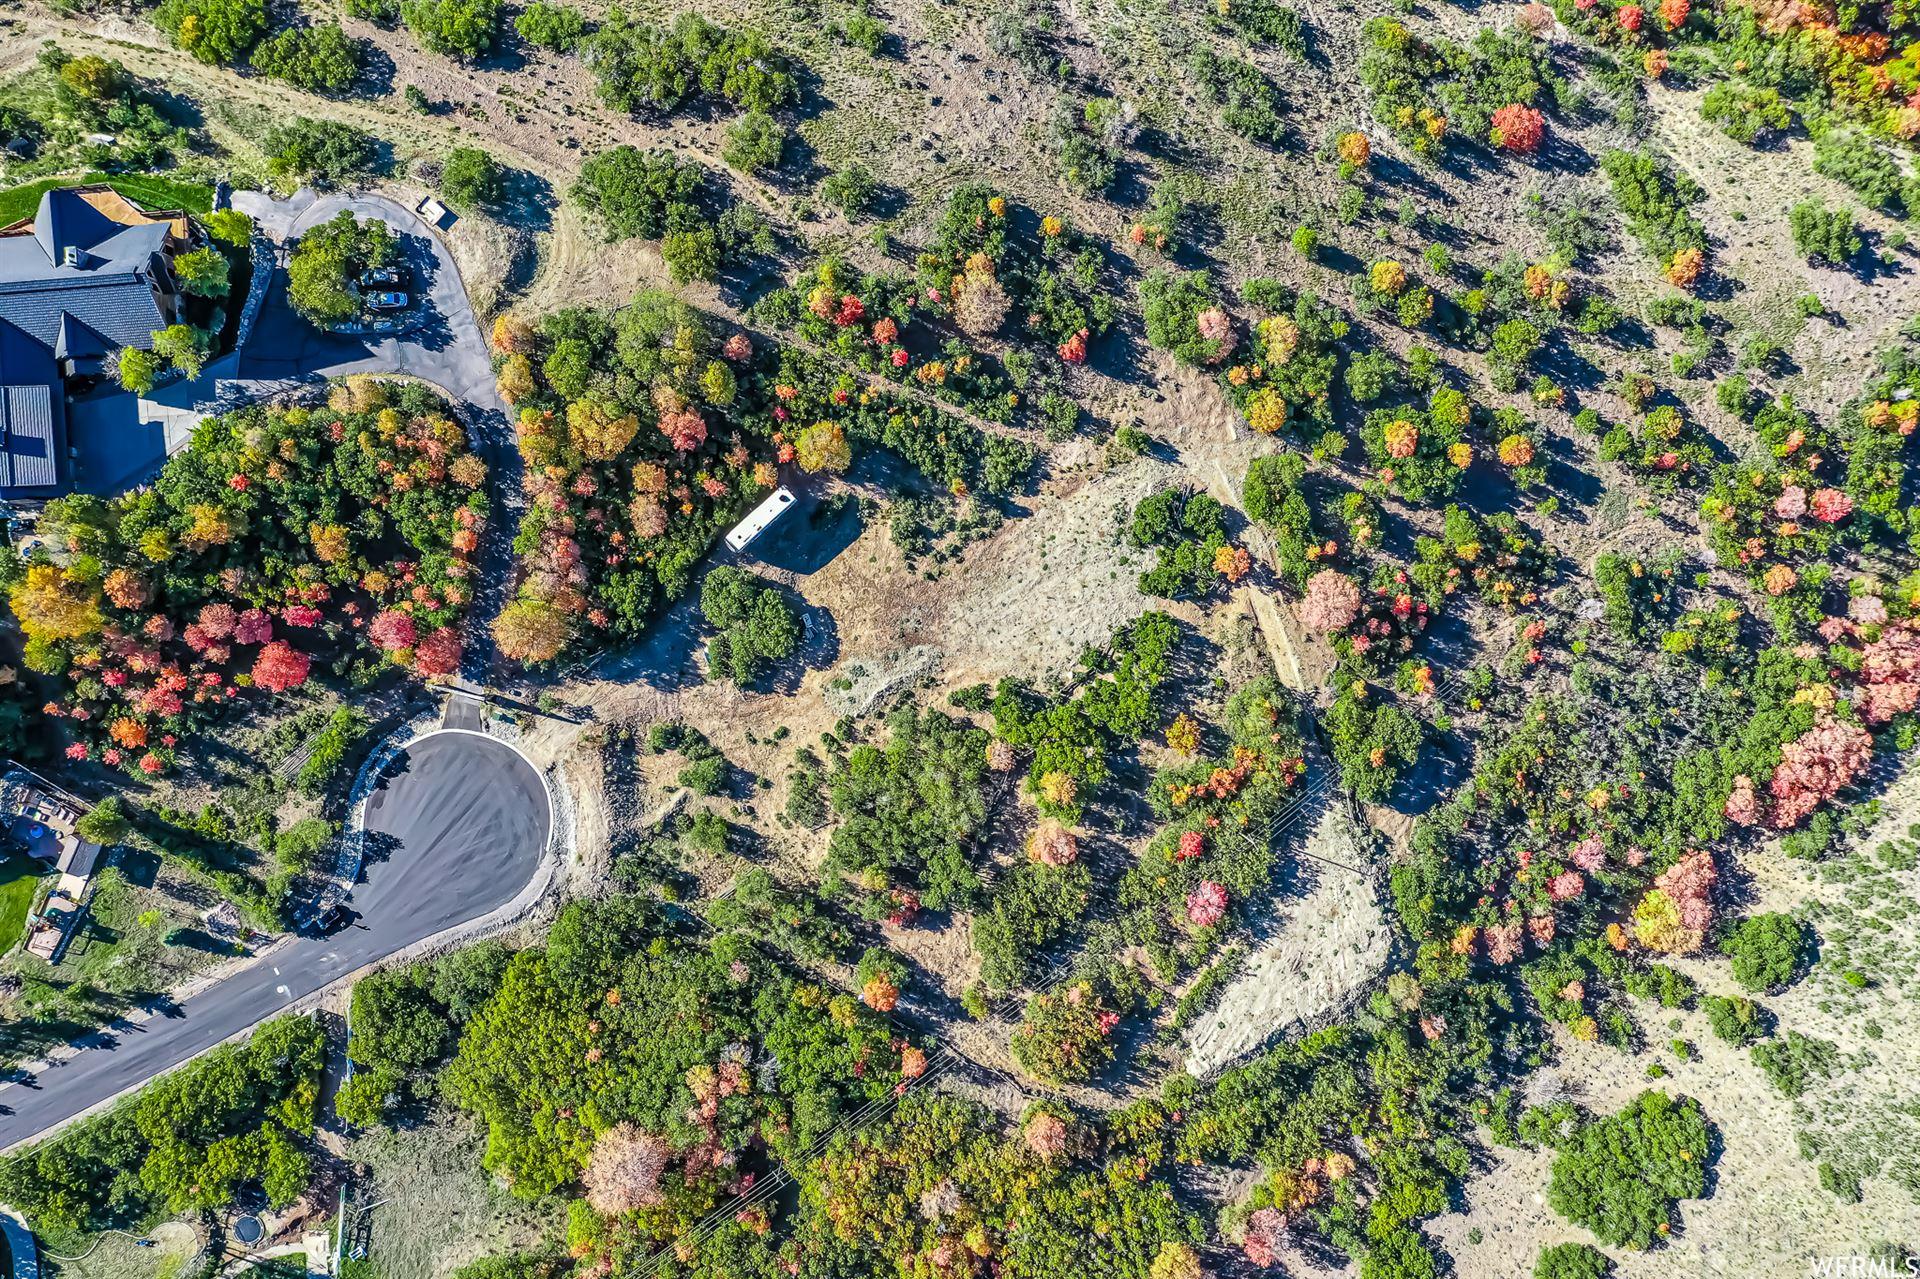 Photo of 222 W ELK POINT CIR, Woodland Hills, UT 84653 (MLS # 1775452)